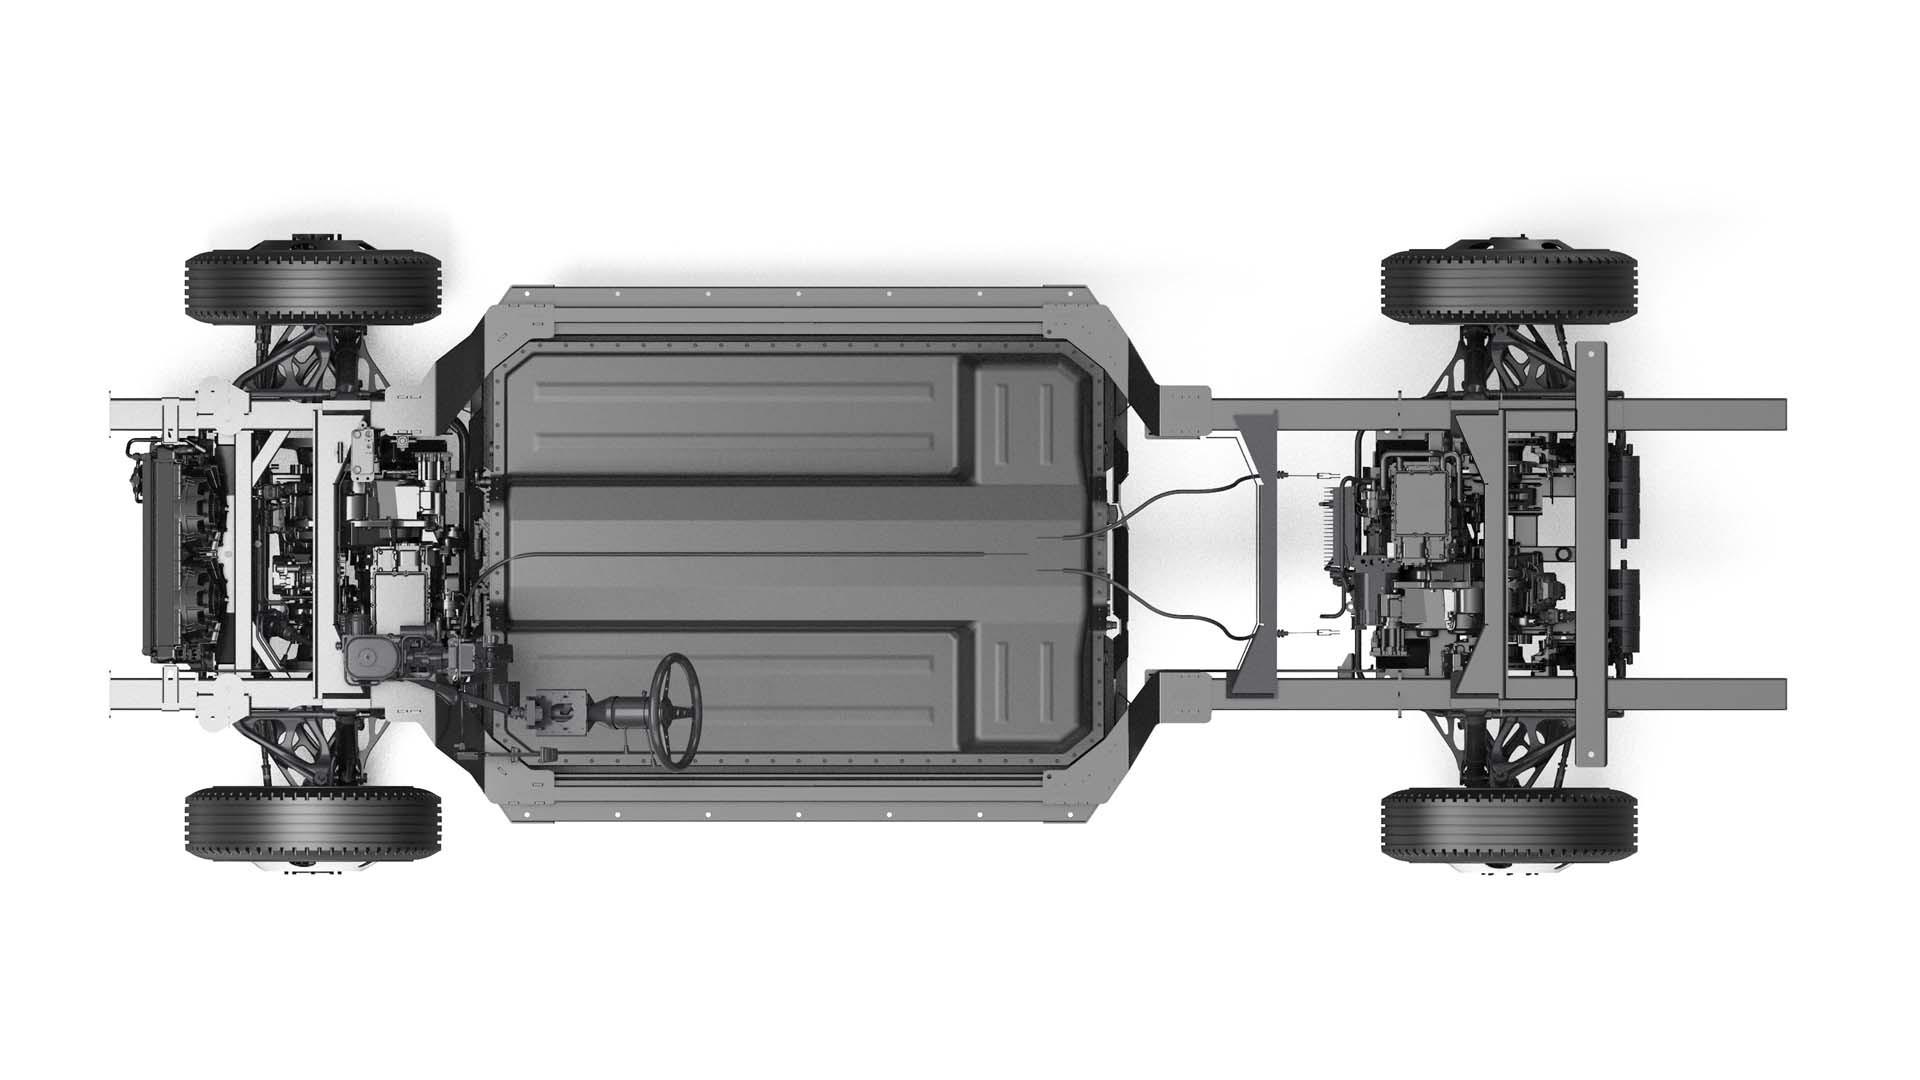 Bollinger Chass-E all-wheel drive